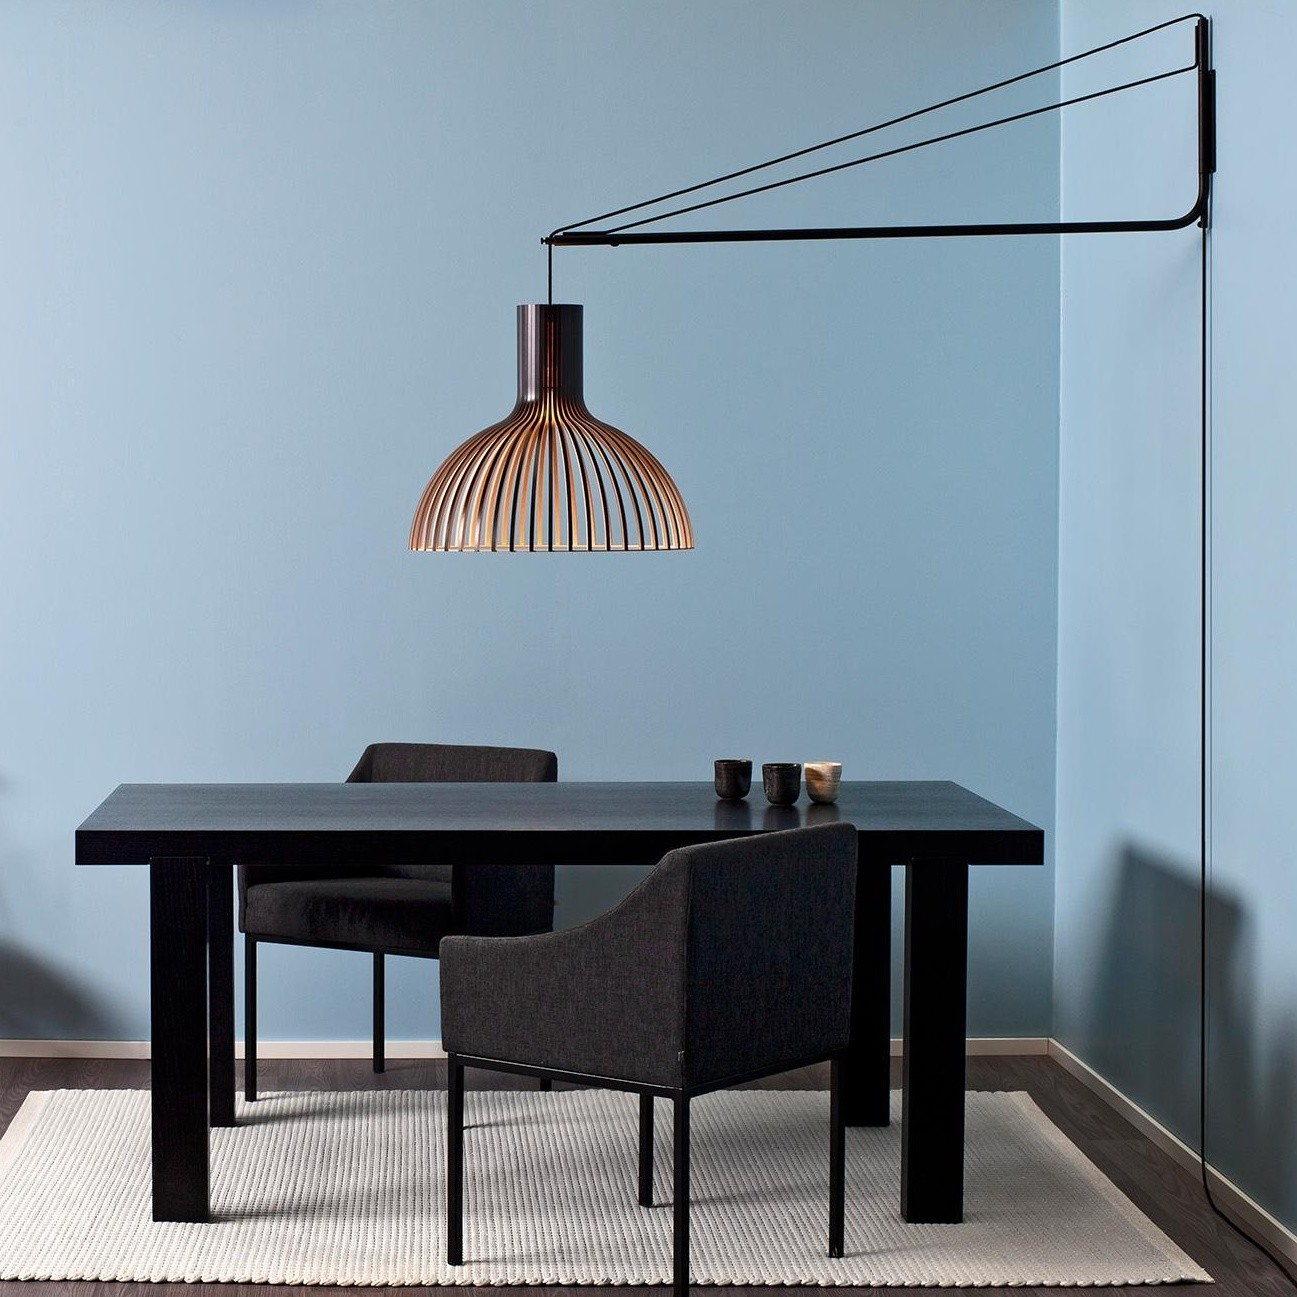 Superb Varsi 1000 Wall Mount Andrewgaddart Wooden Chair Designs For Living Room Andrewgaddartcom